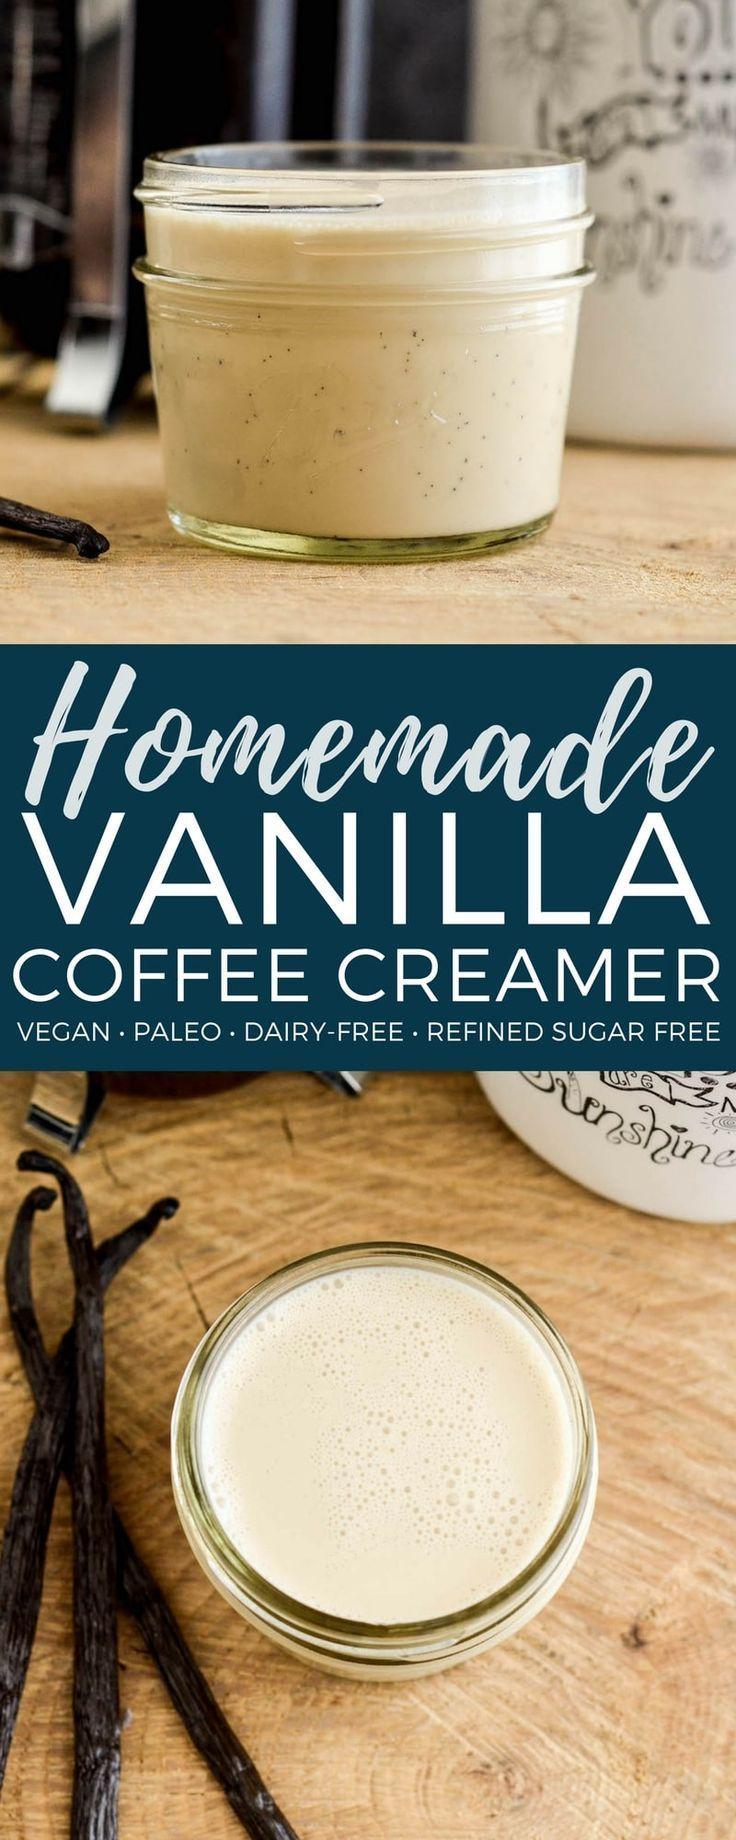 Homemade paleo vanilla coffee creamer a 4 ingredient